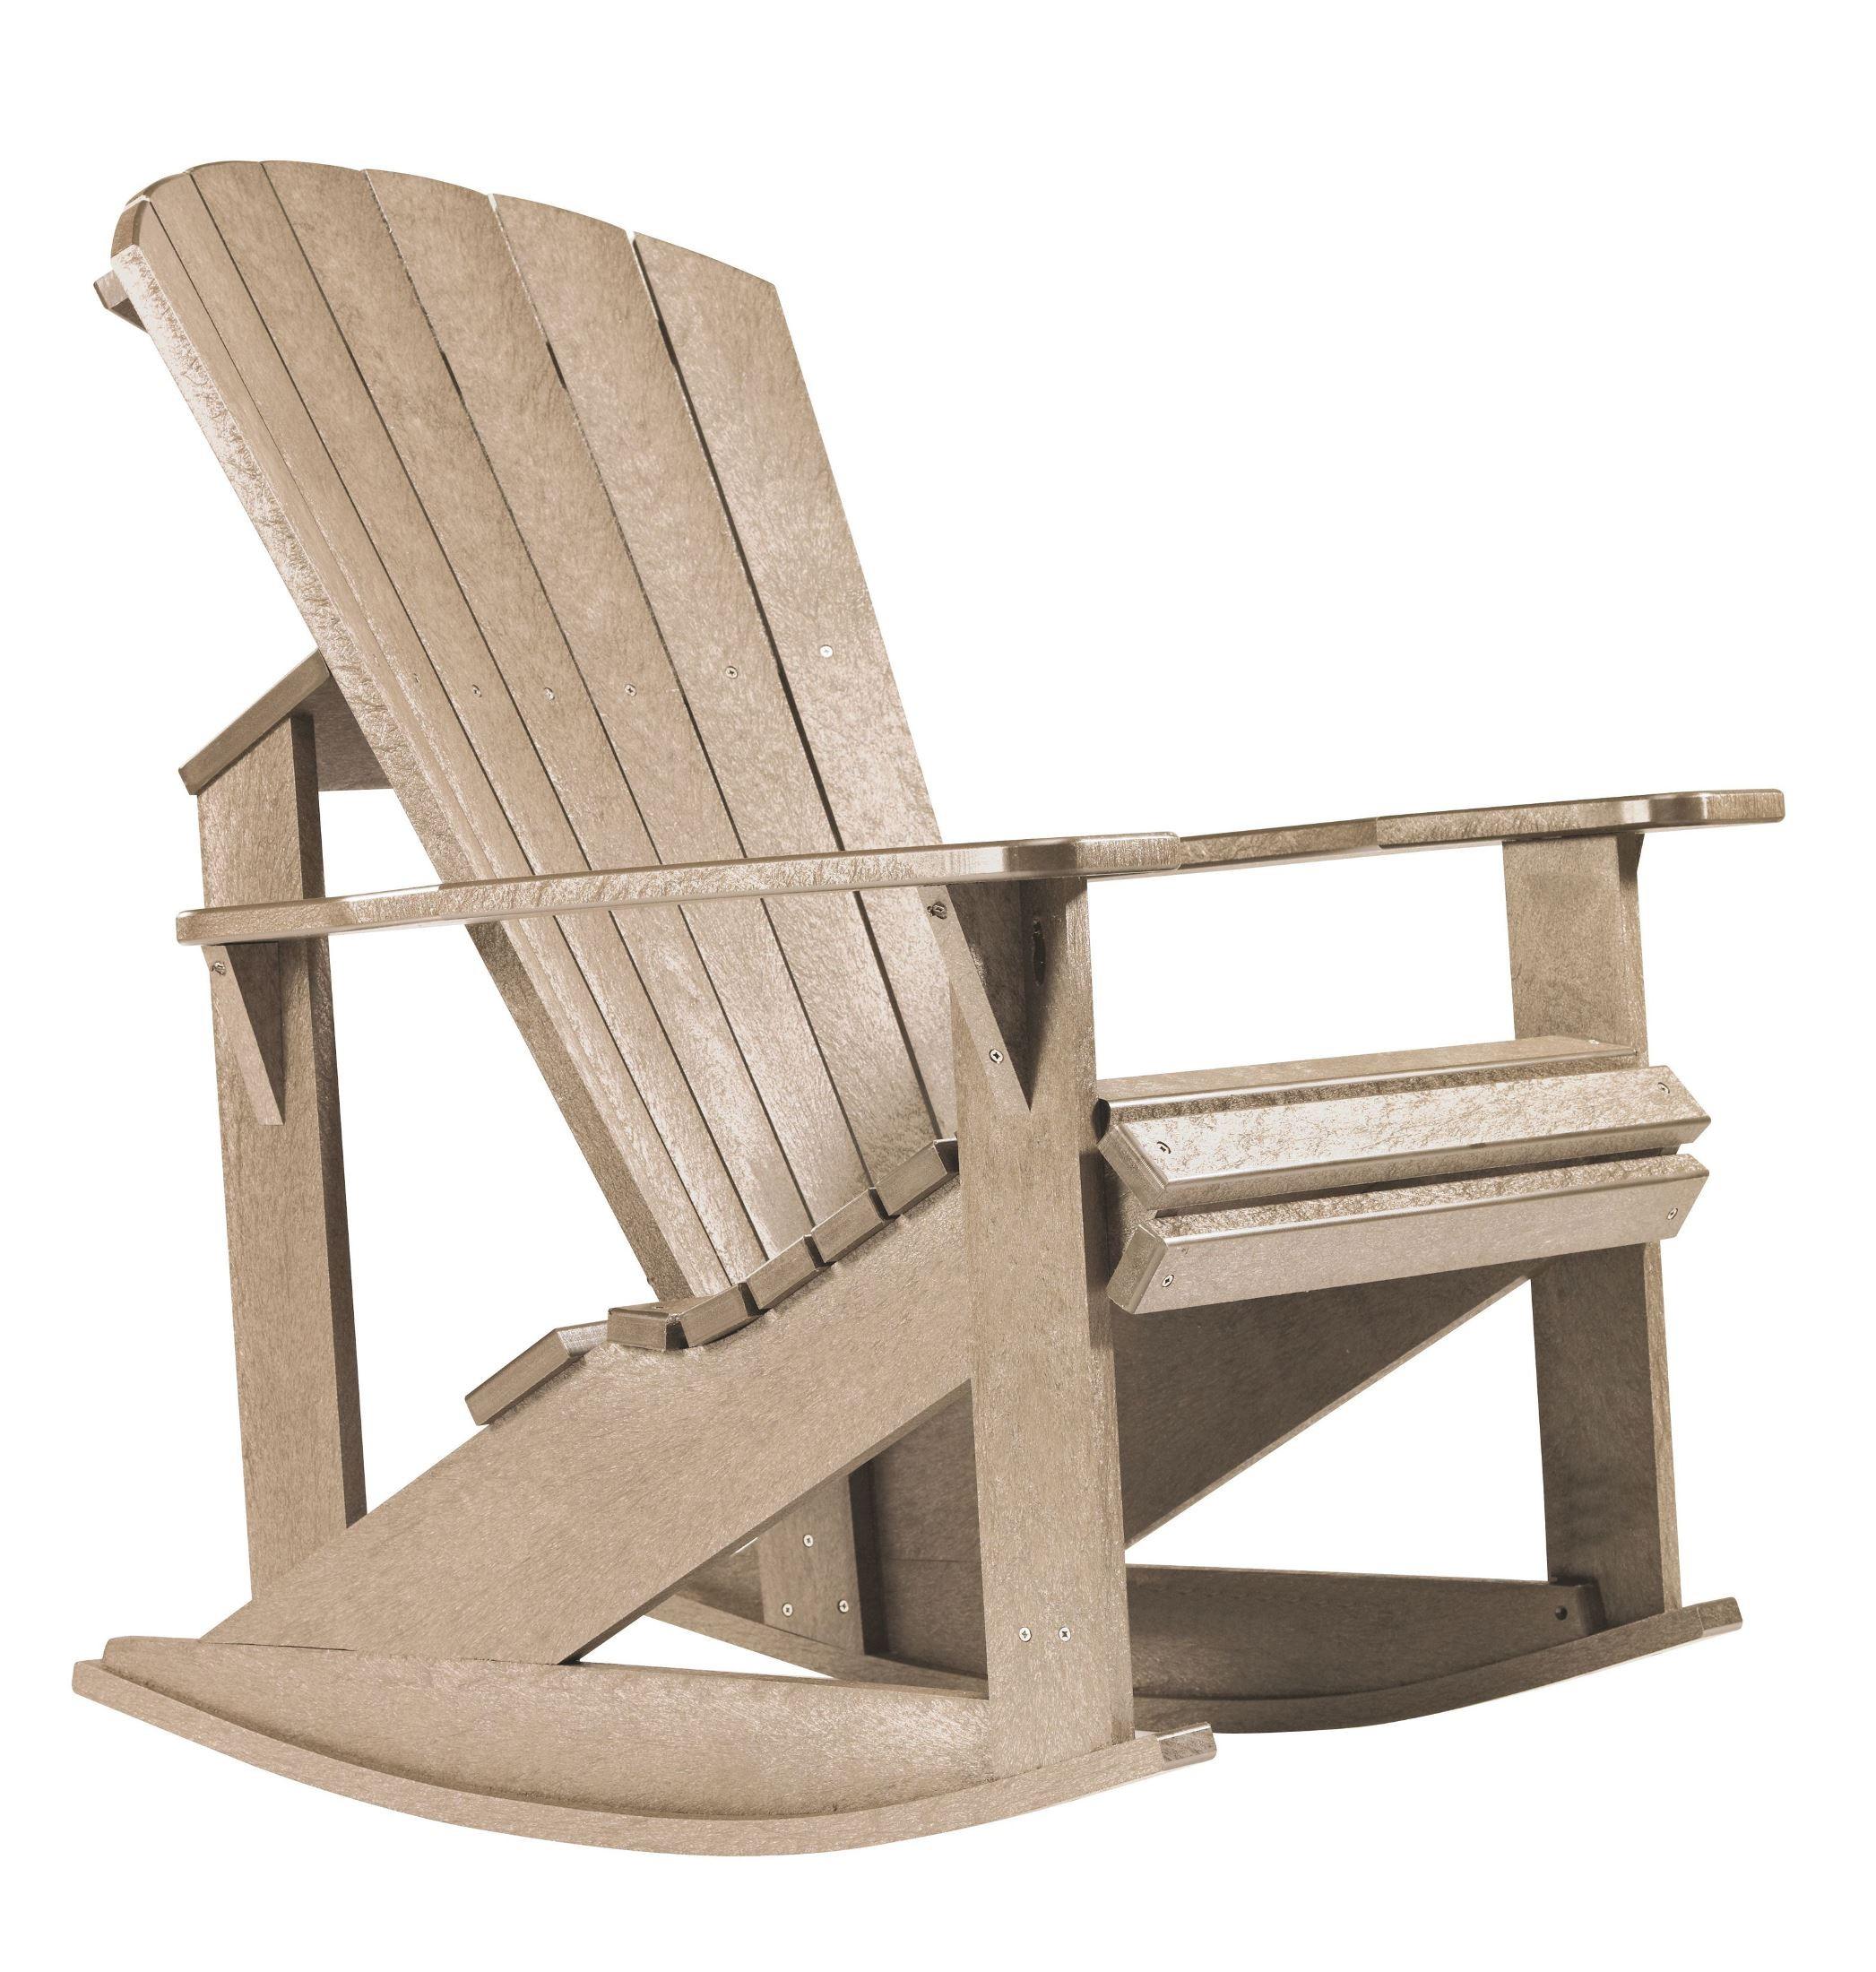 ... Adirondack Rocking Chair from CR Plastic (C04-07)  Coleman Furniture